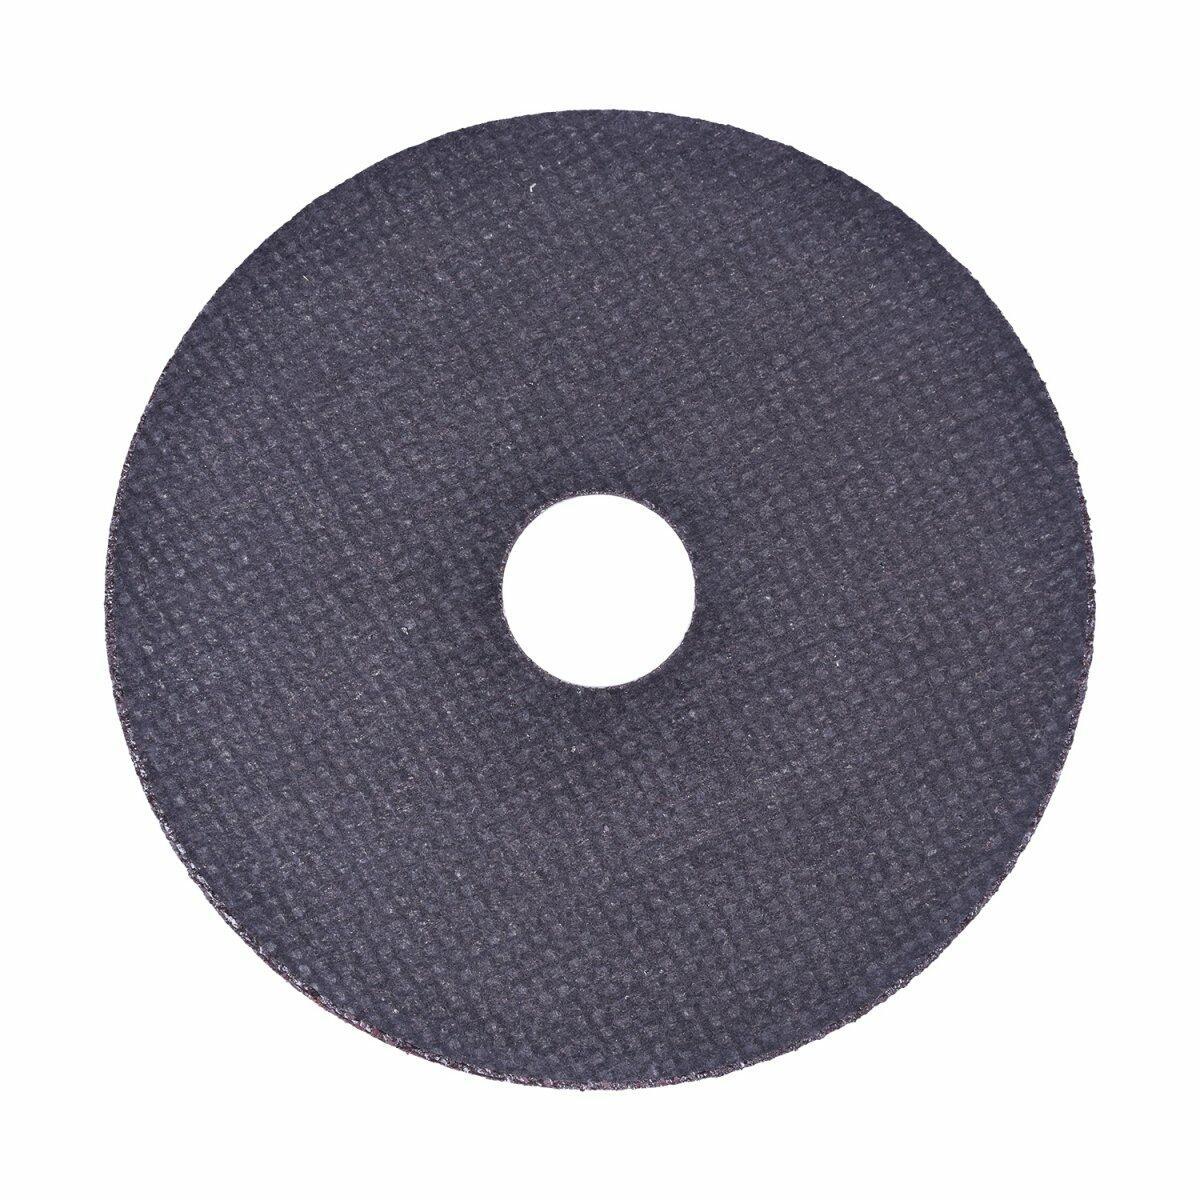 "Esmerilhadeira Angular 4. 1/2"" 800W Dwe4020 Dewalt - 127V+Disco de Corte Multi Material 4. 1/2"" × 1 MM Bumafer"